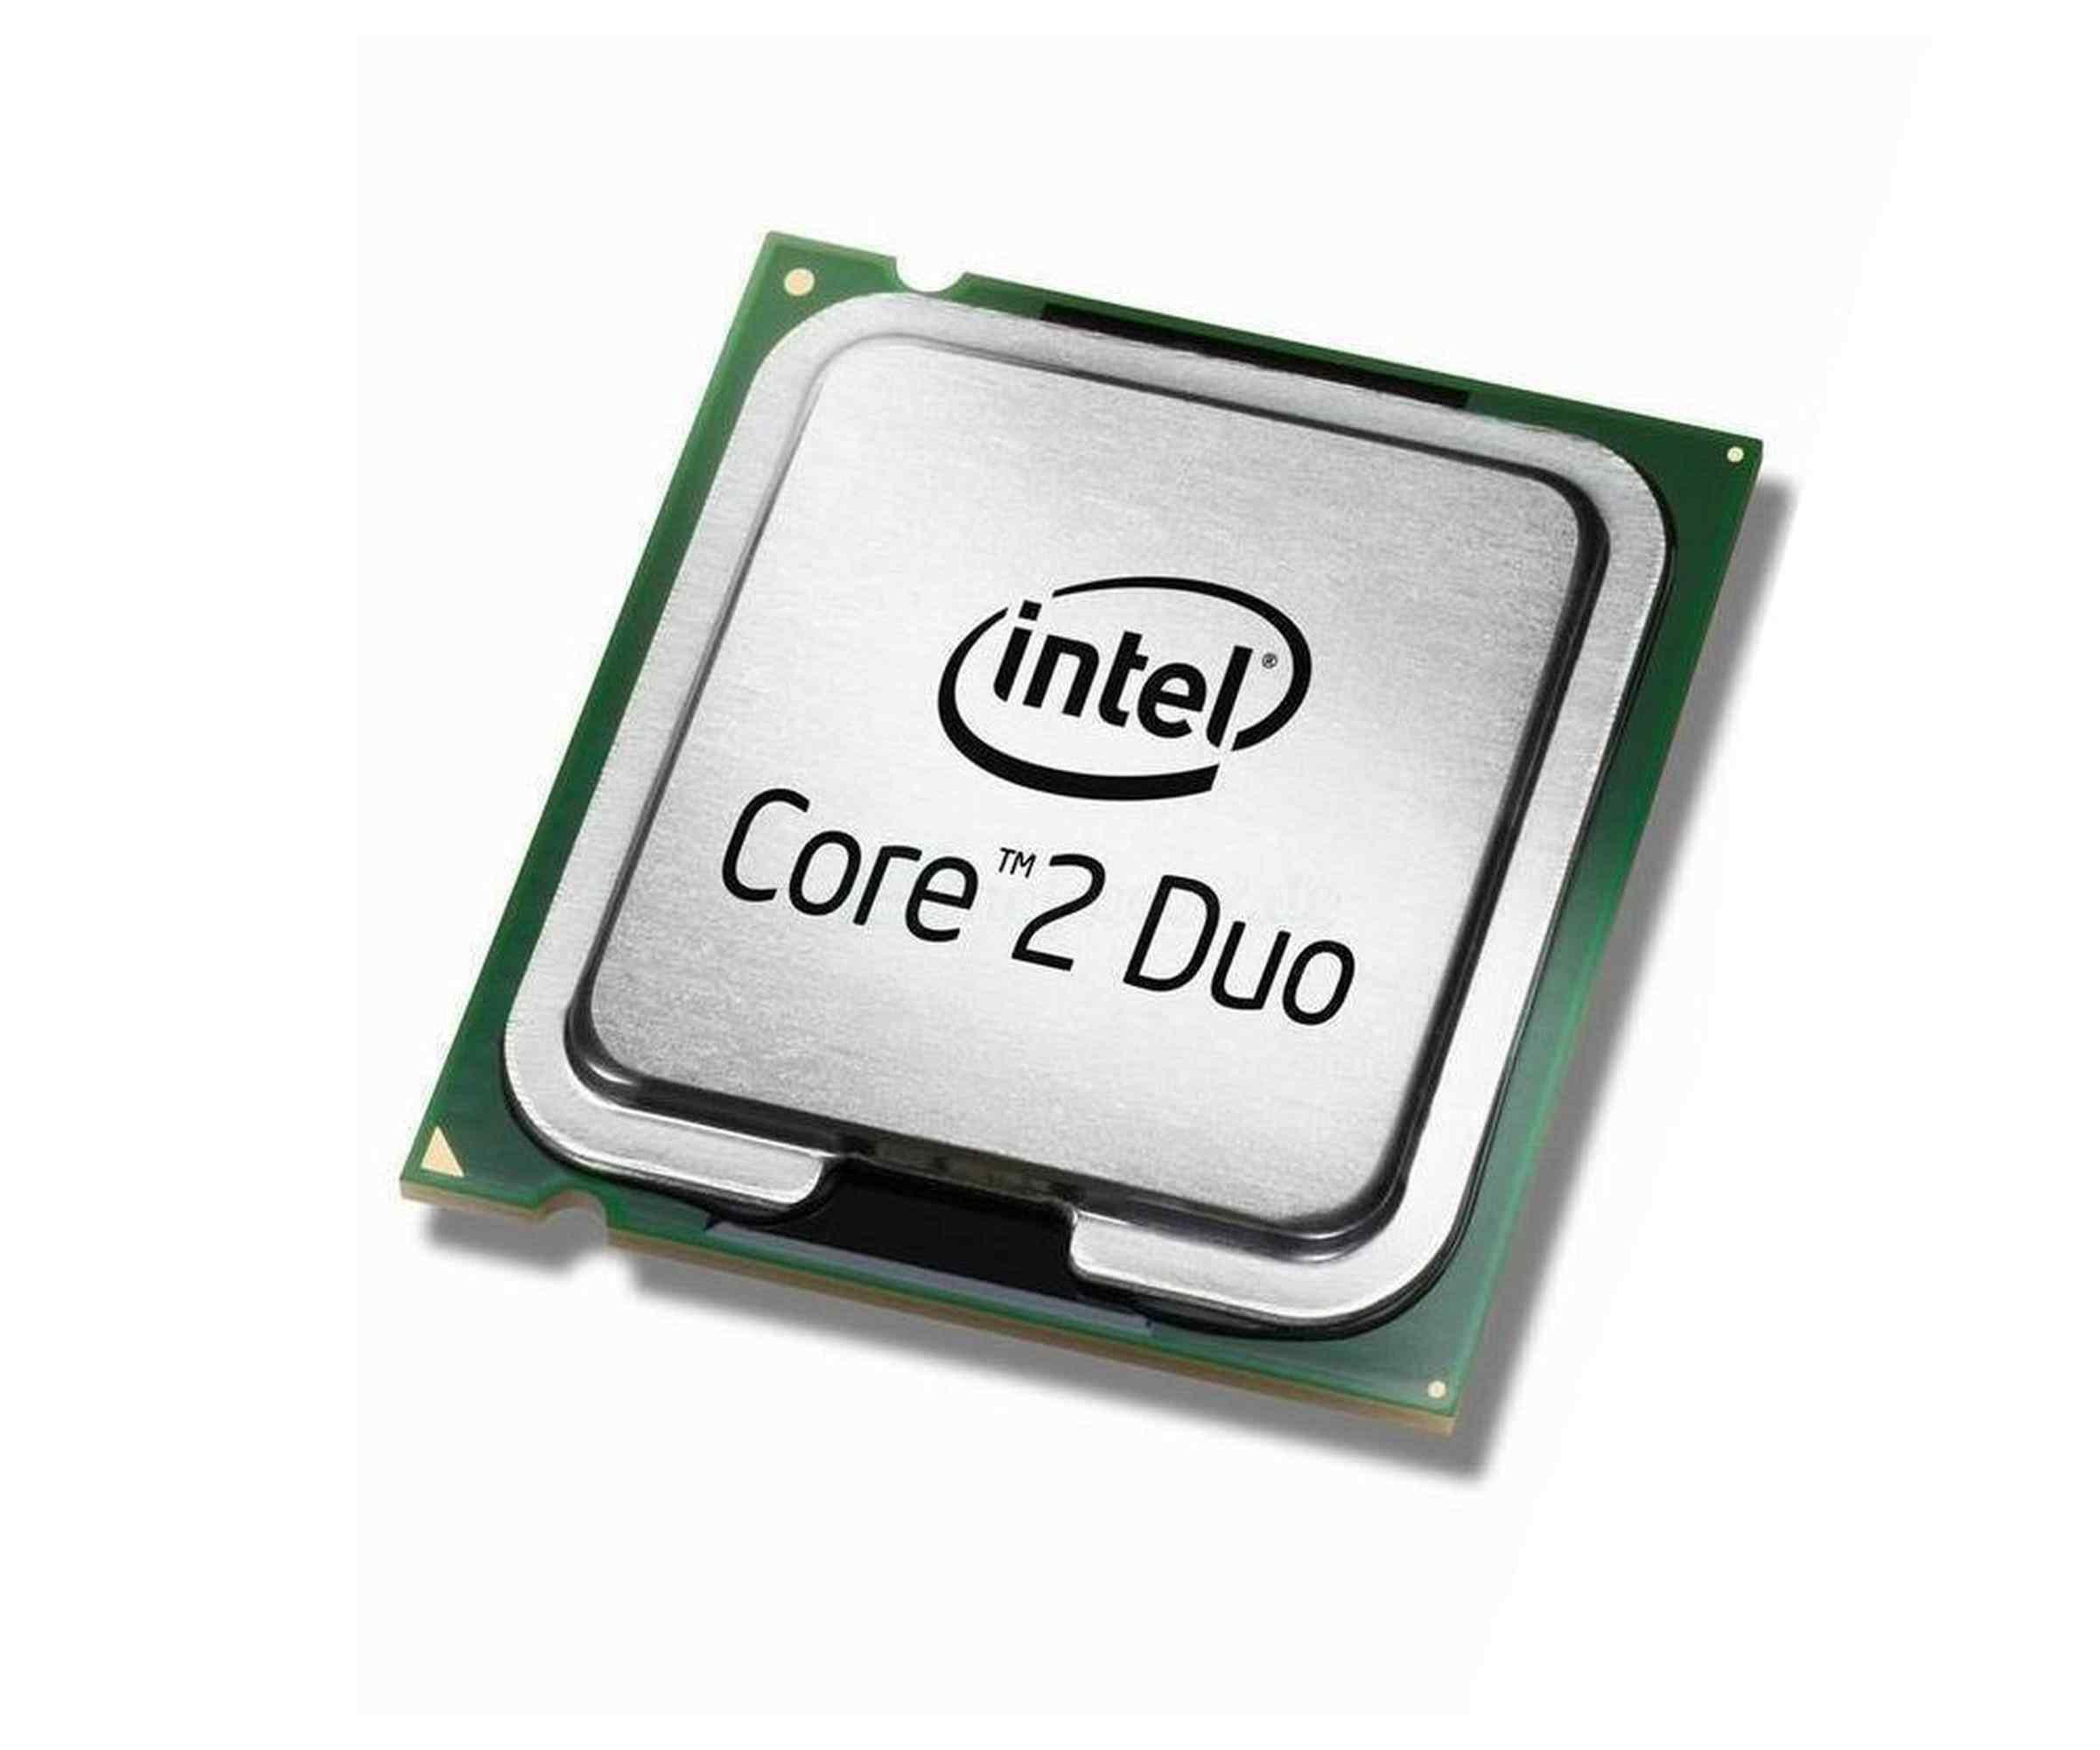 Intel® Core™2 Duo E6550 İşlemci Intel® Core™2 Duo E6550 İşlemci